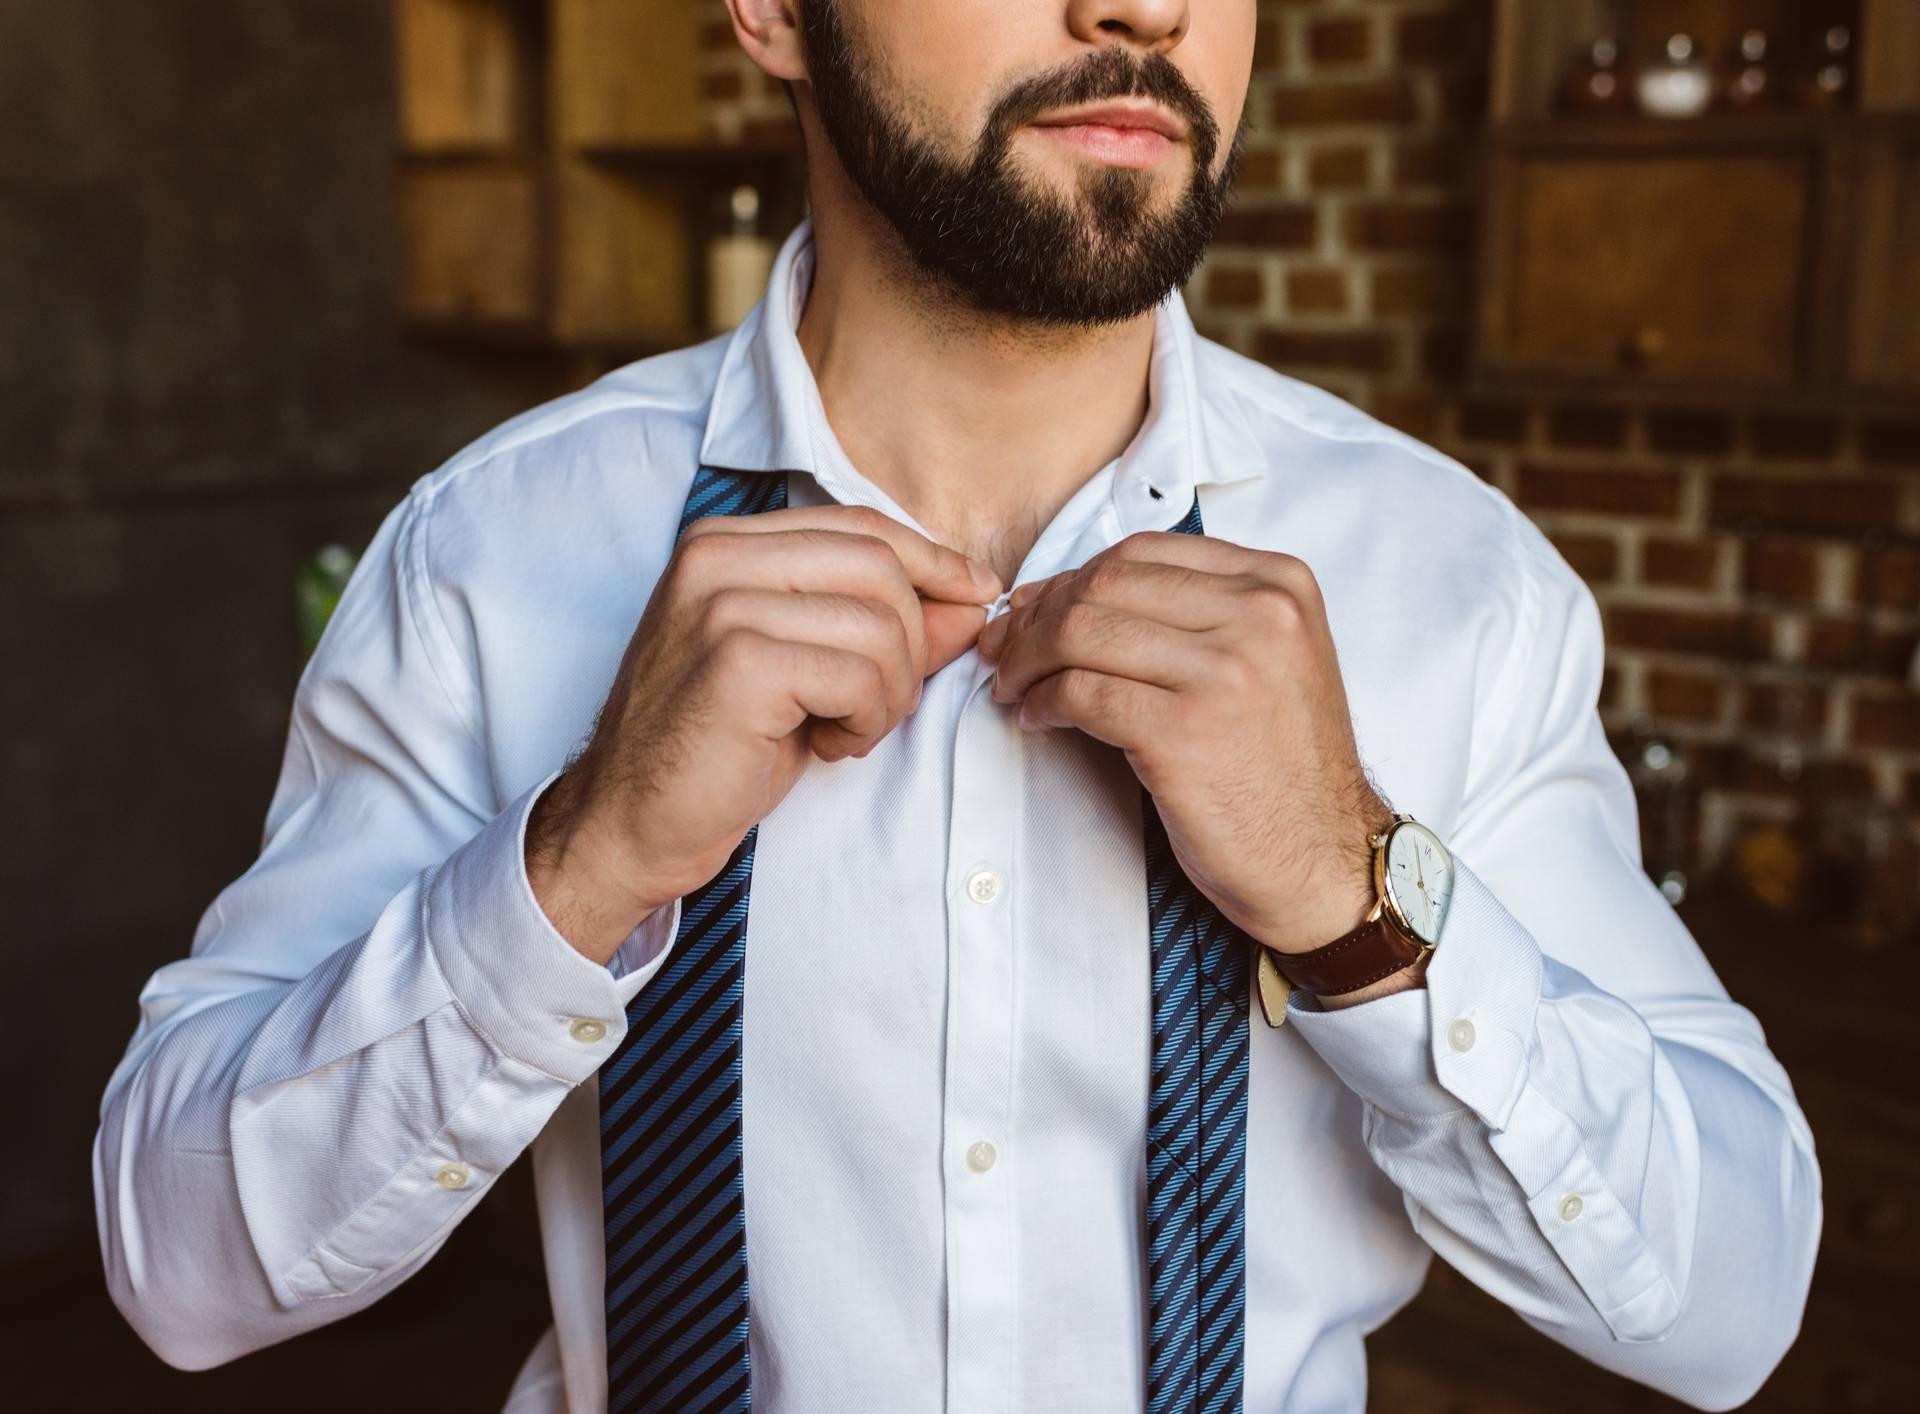 businessman fastening buttons on shirt